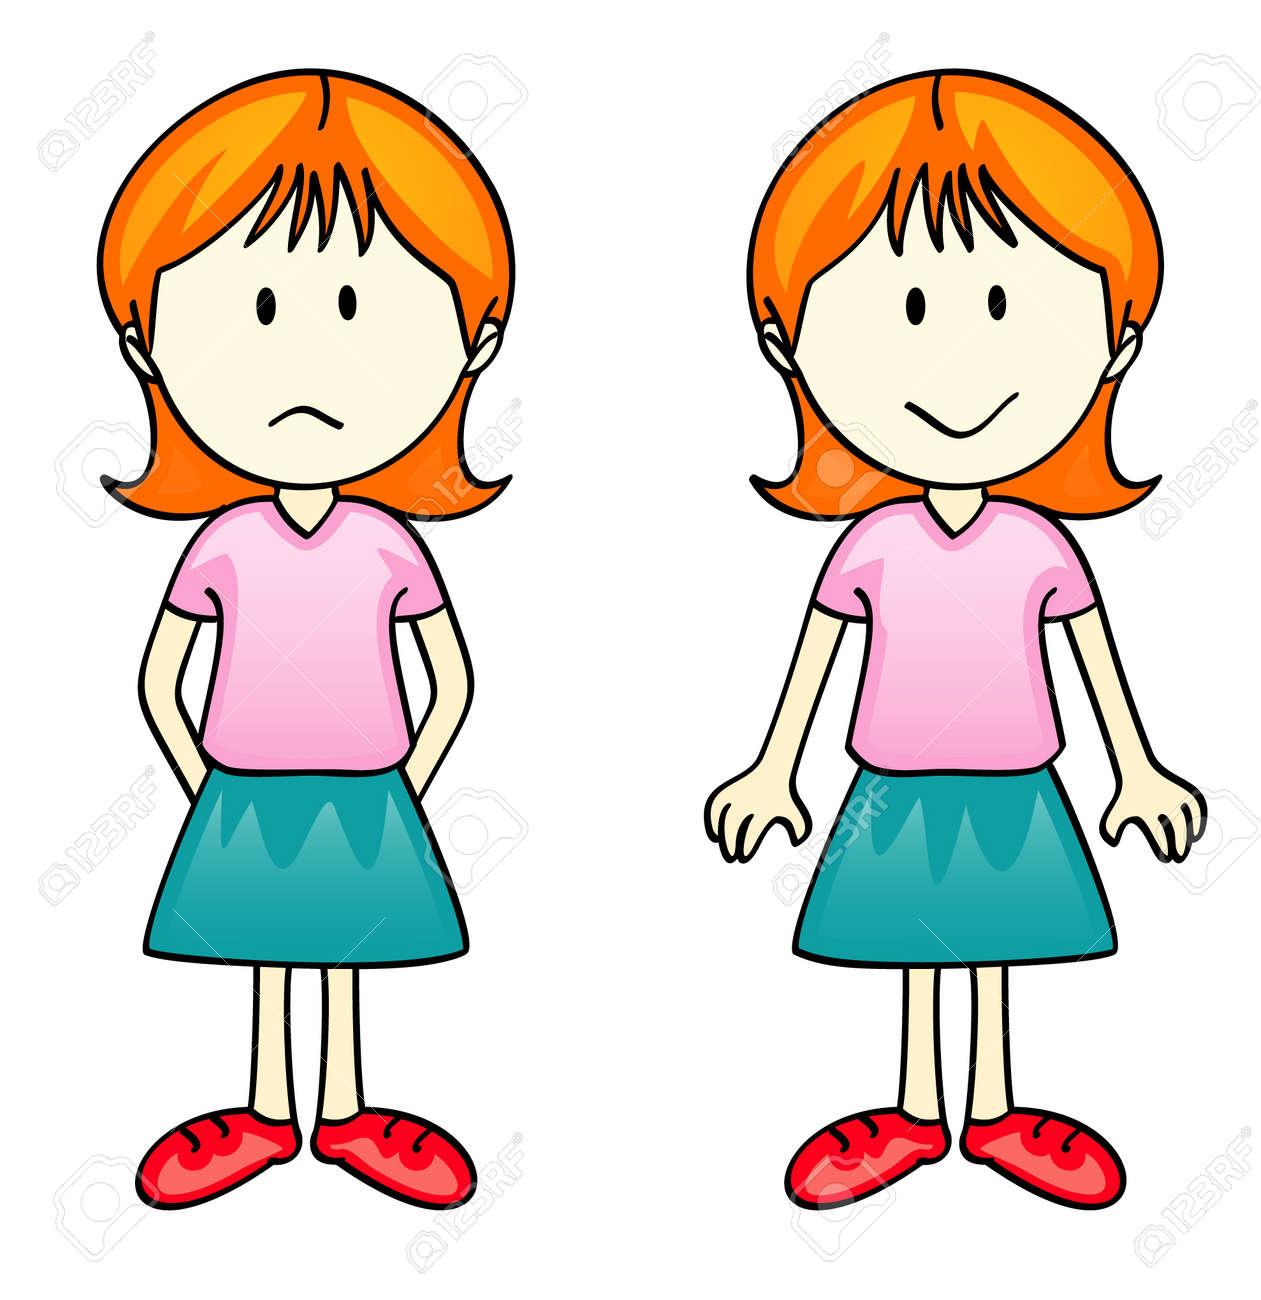 Sad Girl Cliparts, Stock Vector And Royalty Free Sad Girl ...